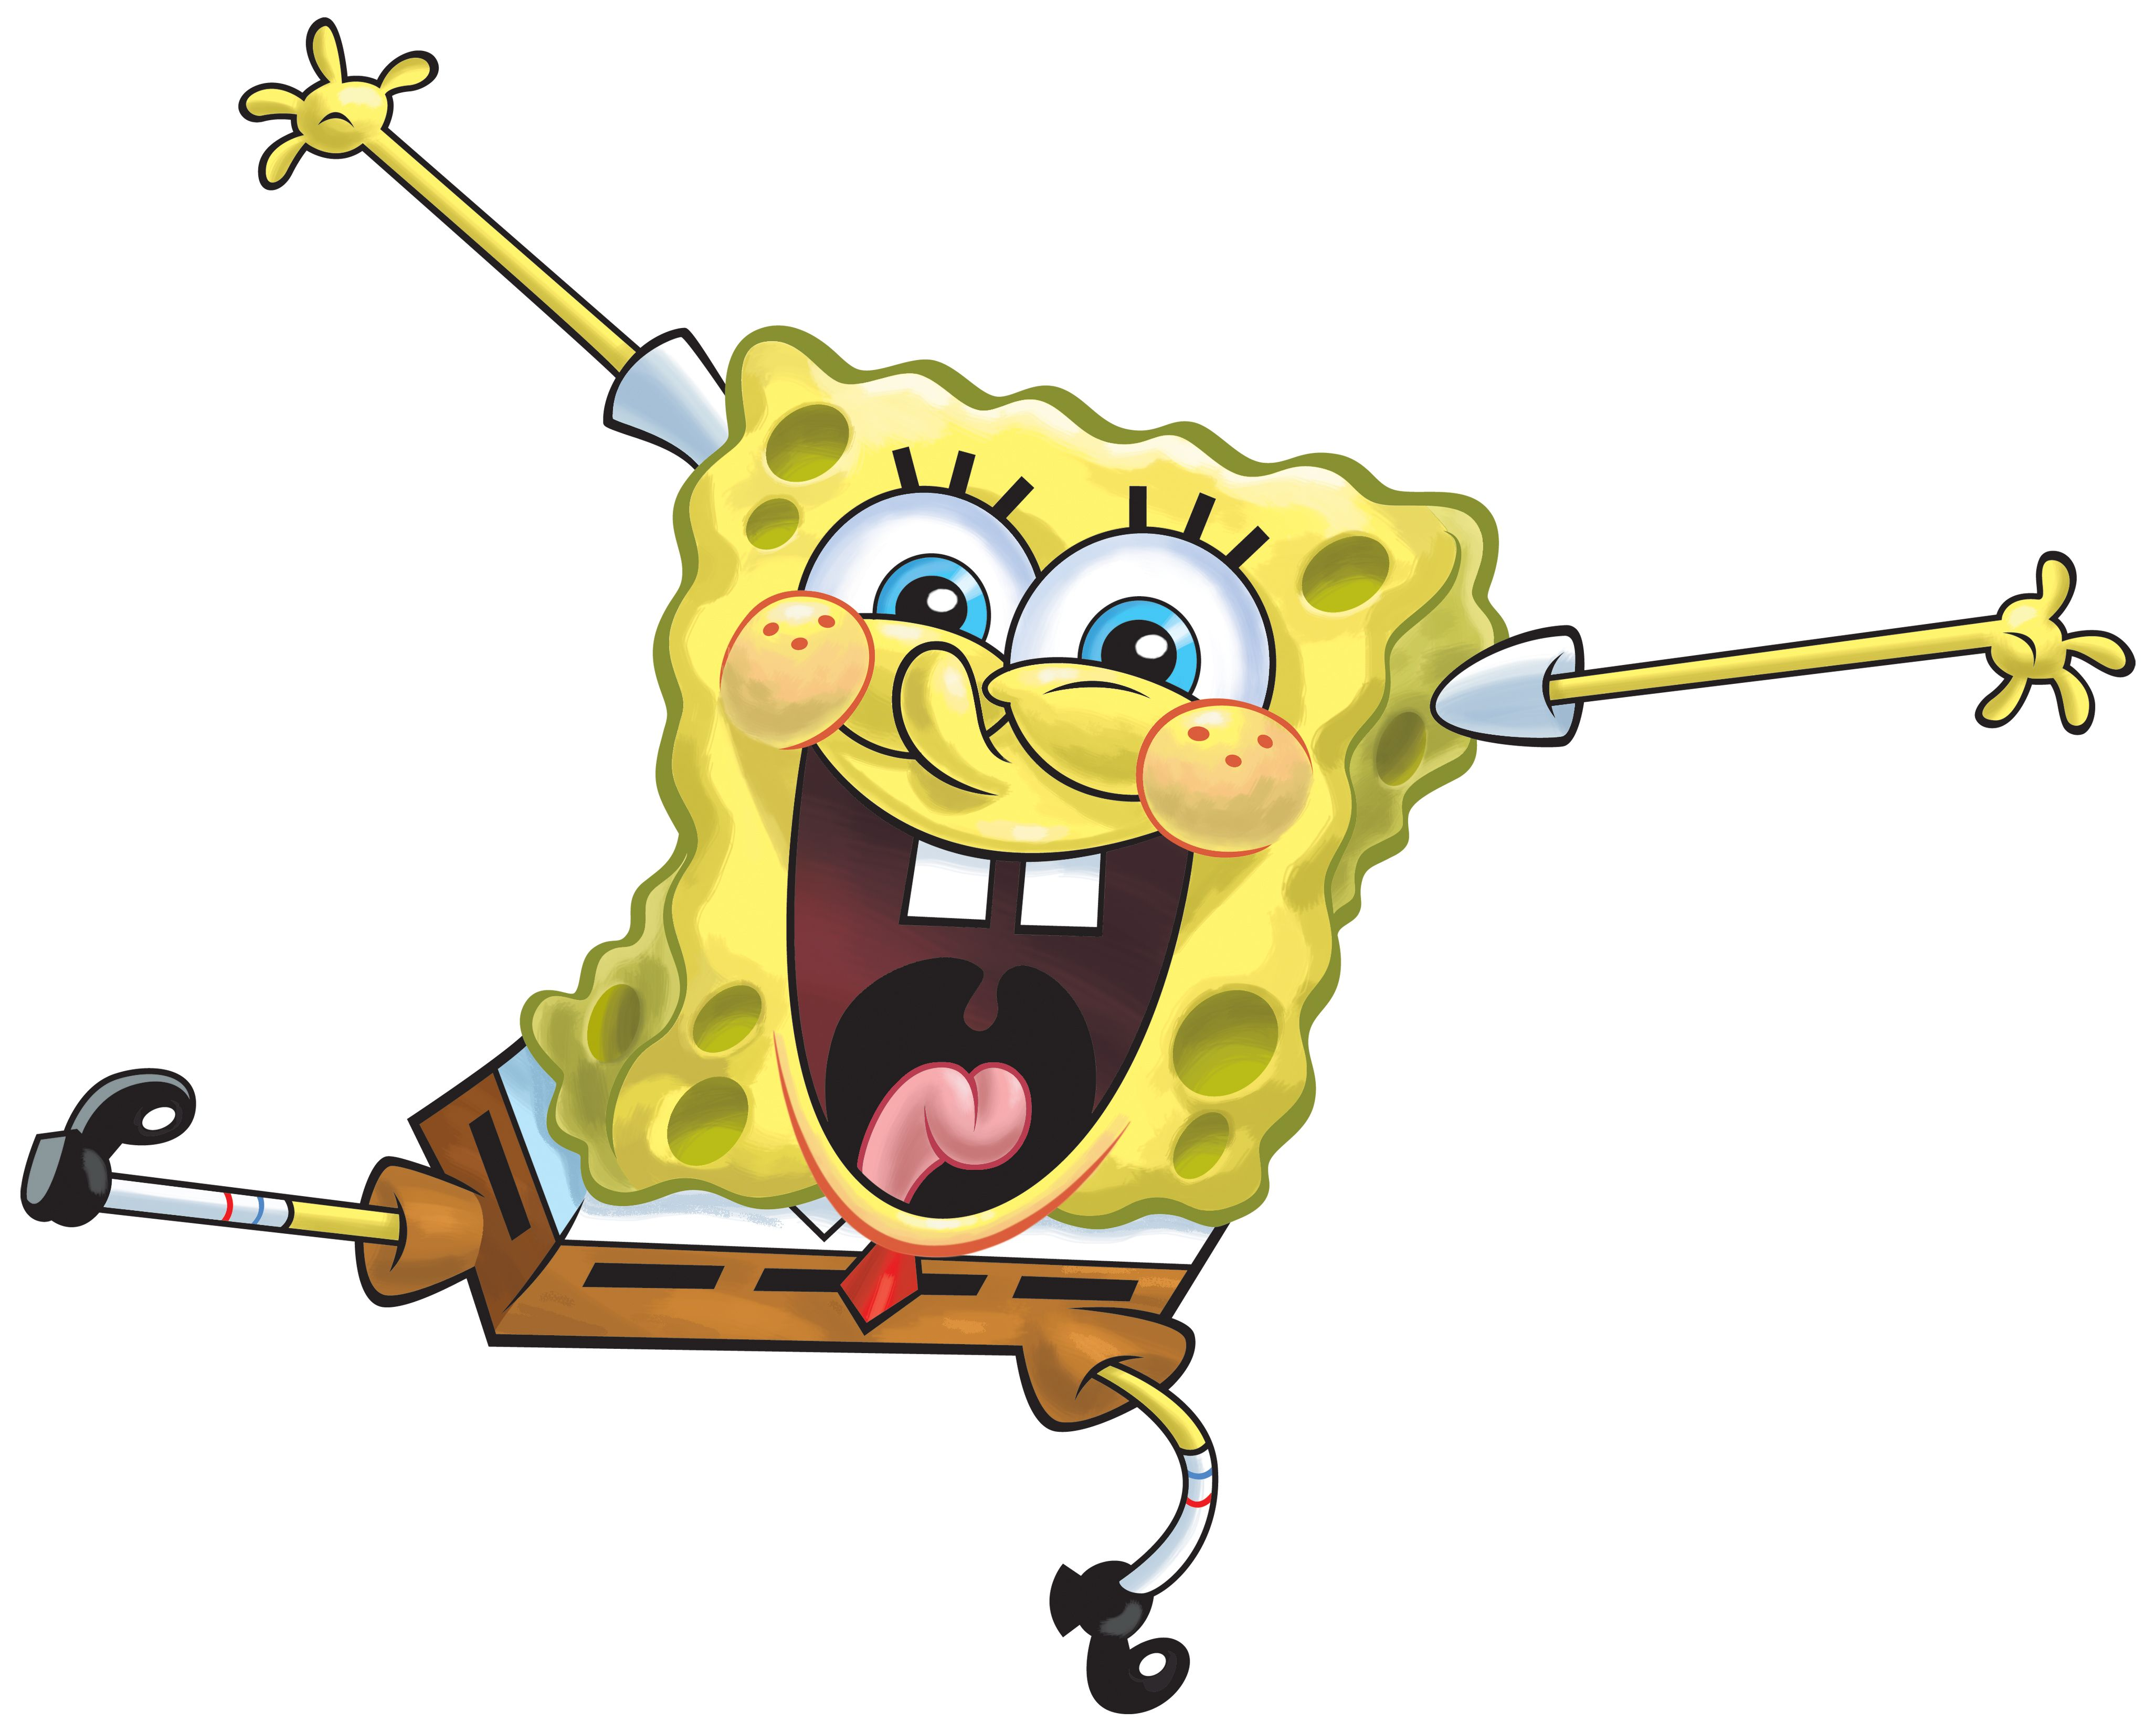 burbujas  Spongebob Squarepants  Pinterest  Kid Bobs and A